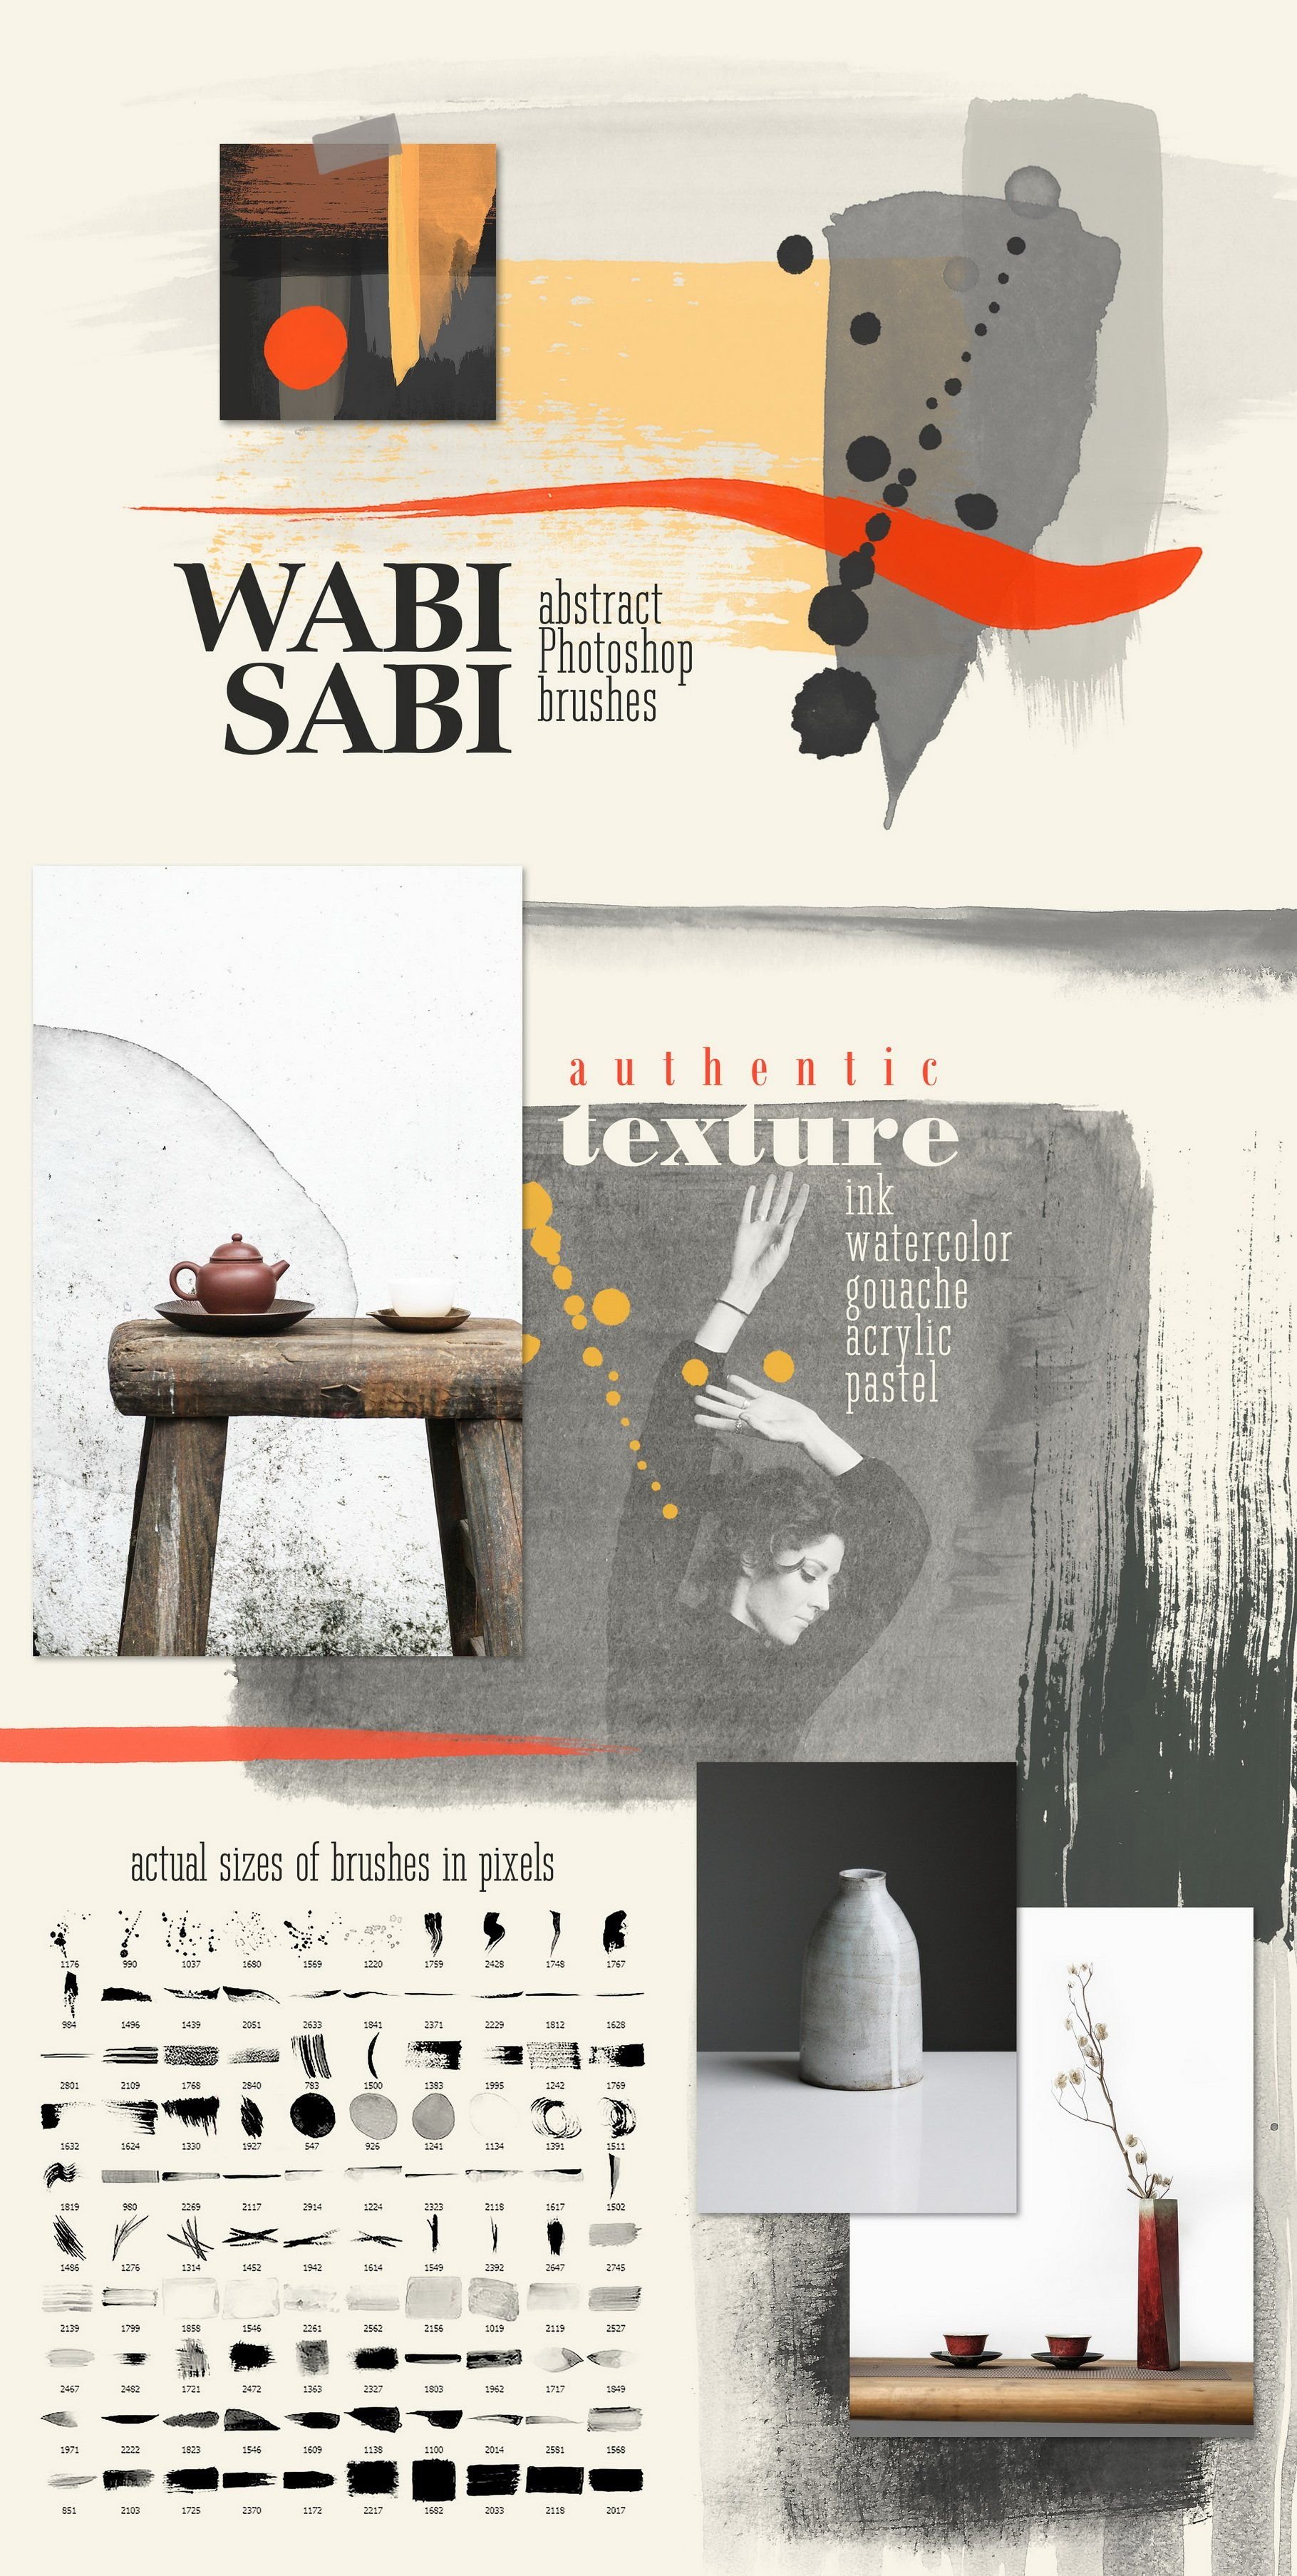 Wabi Sabi Photoshop Procreate Stamps Photoshop Abstract